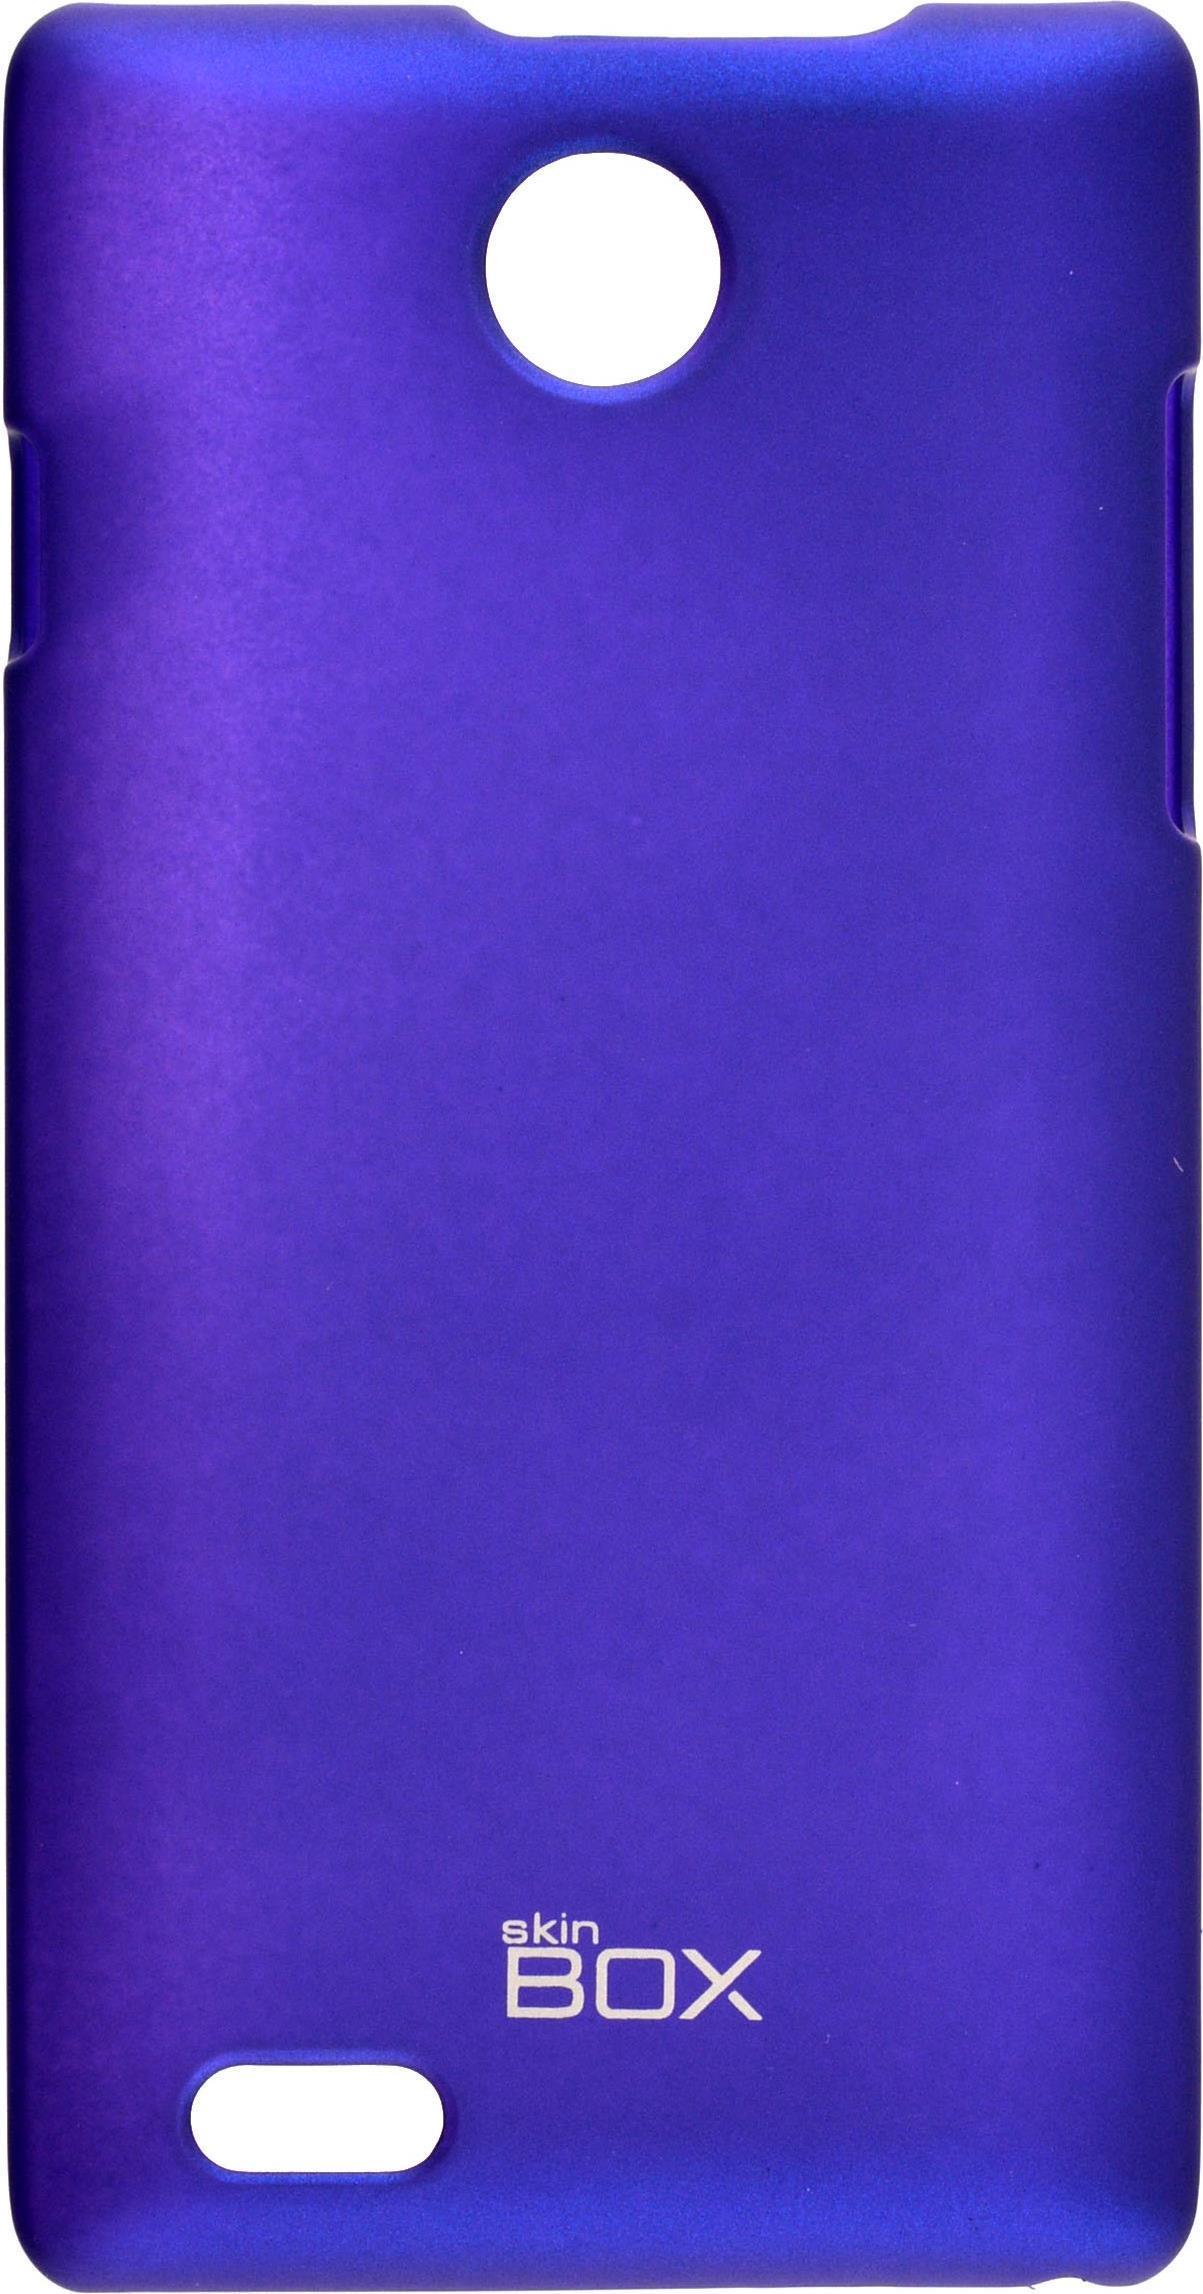 Чехол для сотового телефона skinBOX 4People, 4630042526877, синий все цены